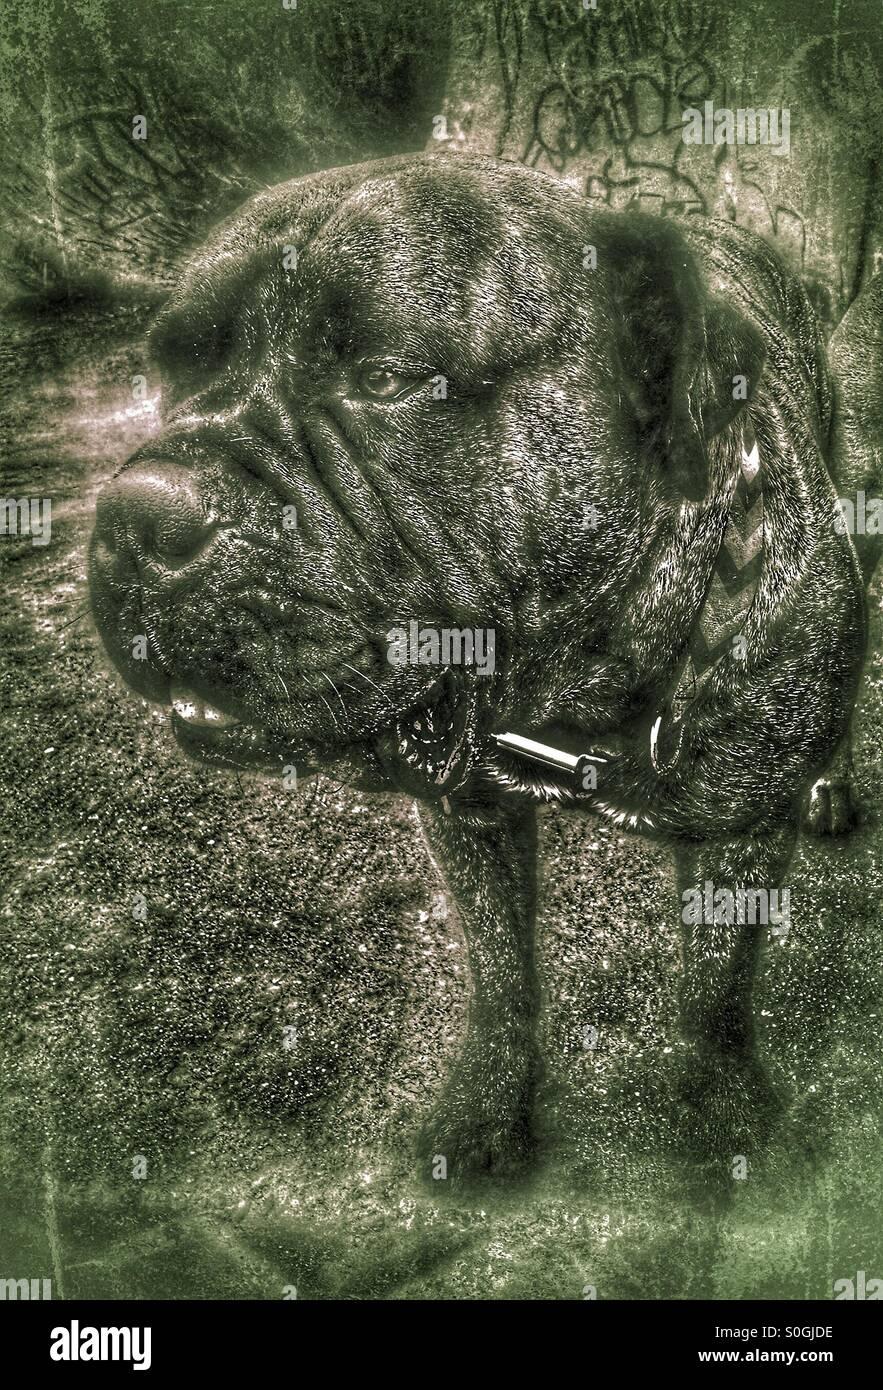 Bullmastiff male dog worlds largest dogs - Stock Image